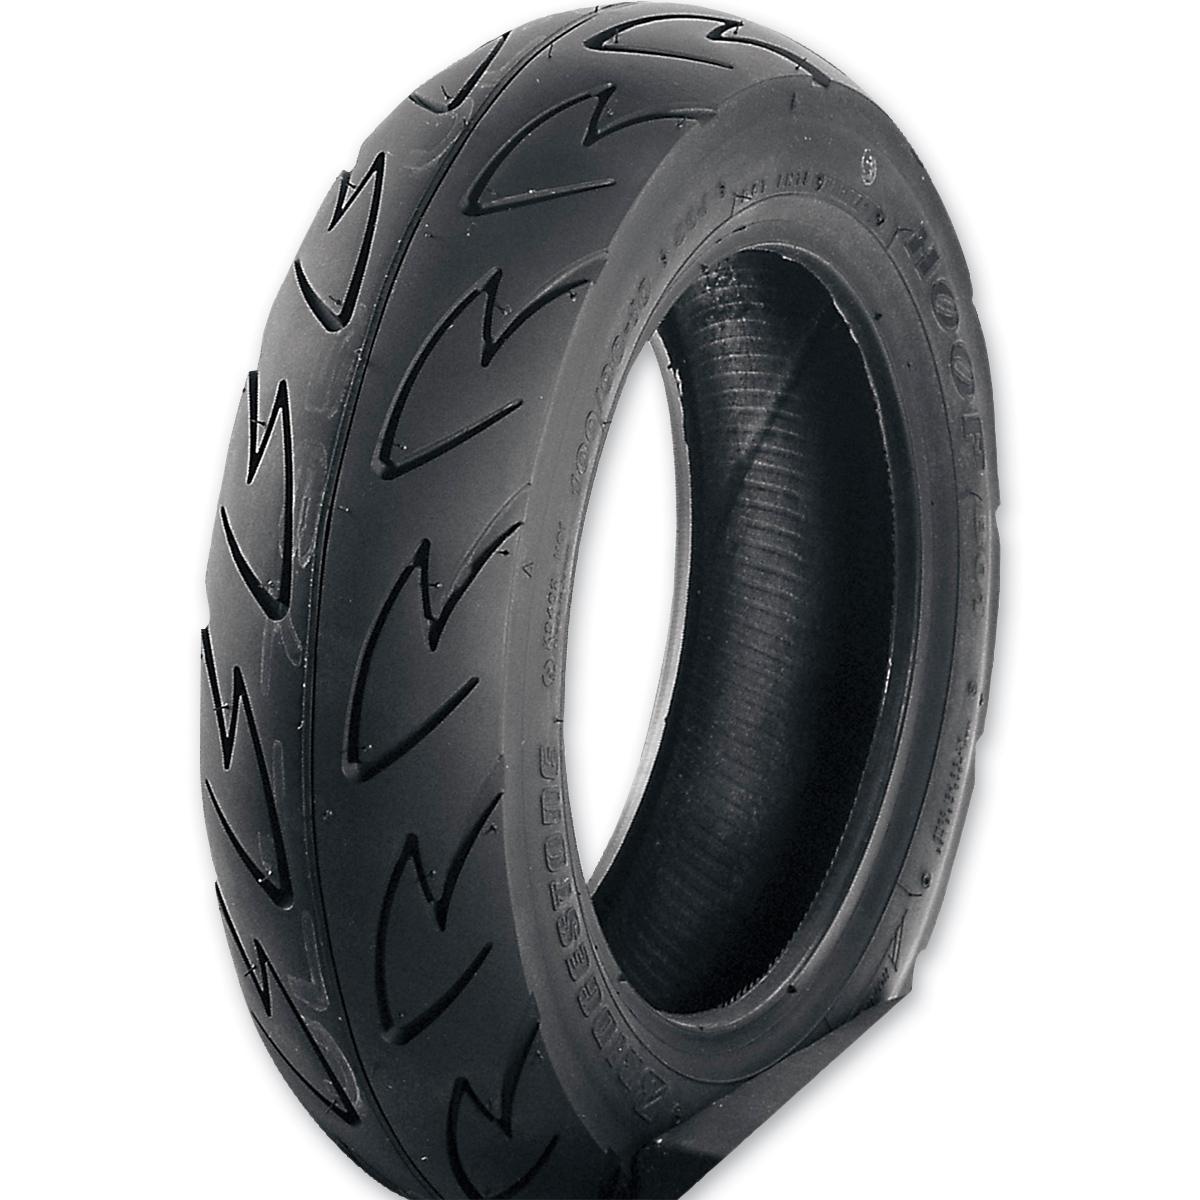 Bridgestone B03-G HOOP 120/80-14 Front Tire